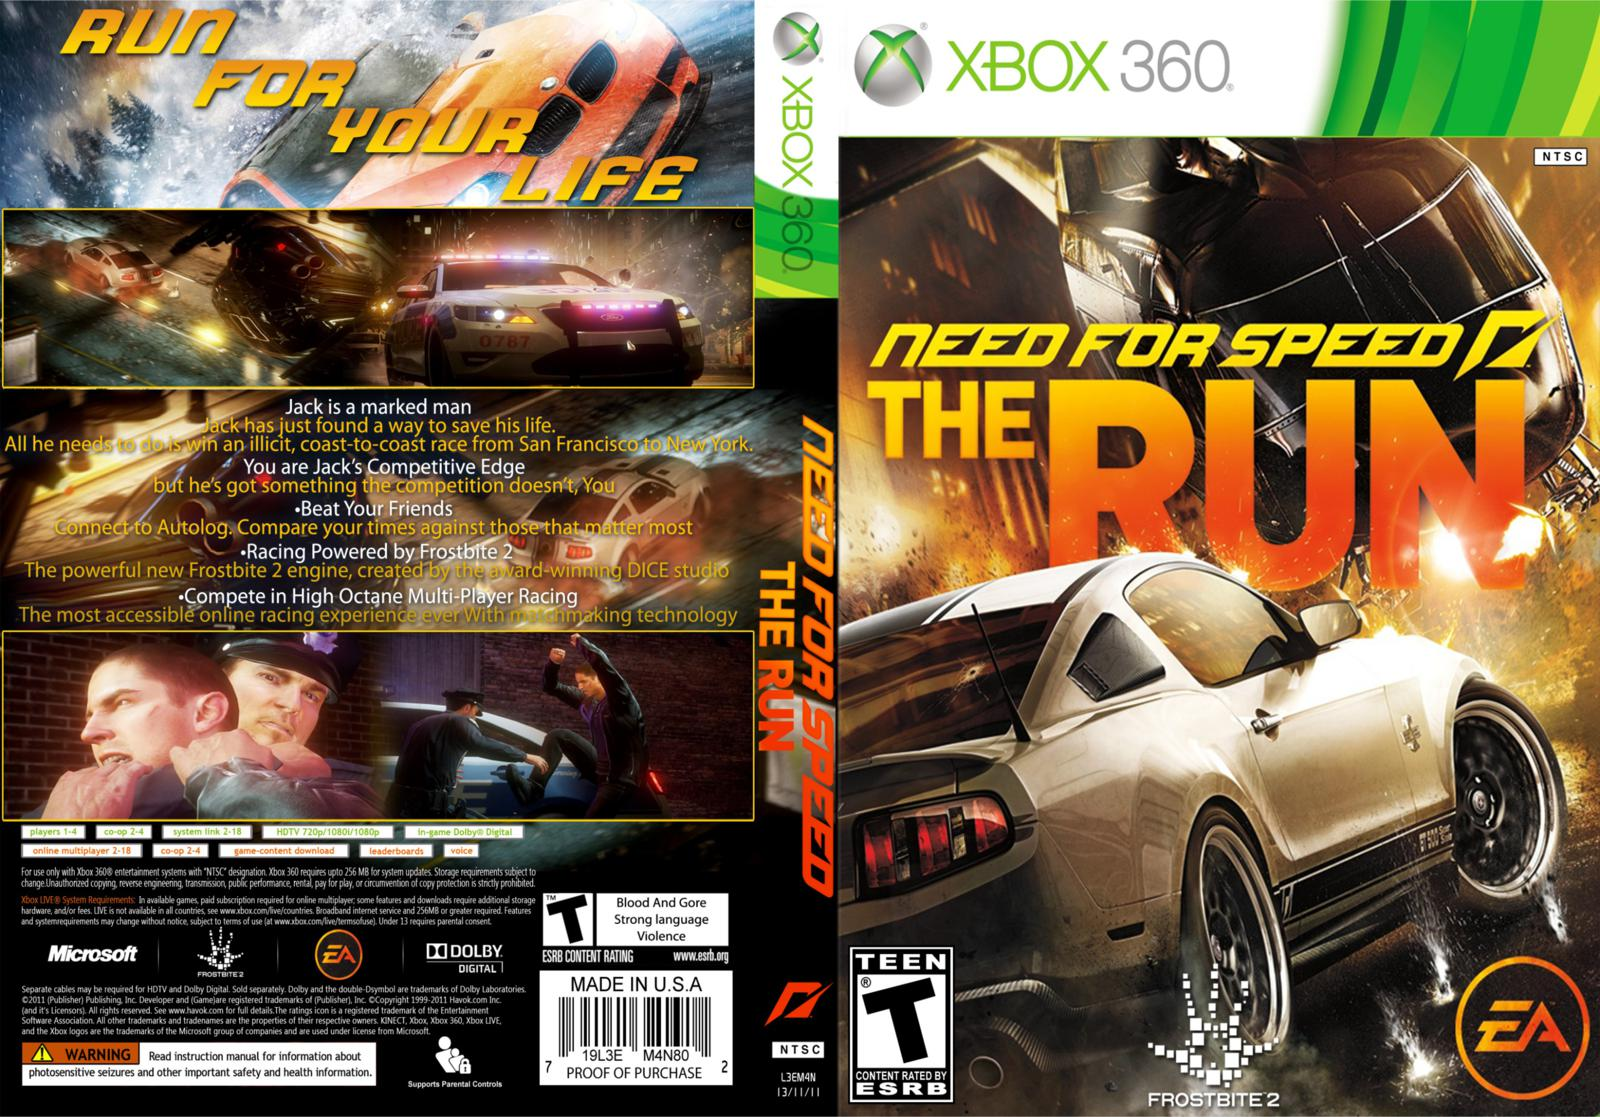 RGH360LTU: XBOX 360 NEED FOR SPEED THE RUN